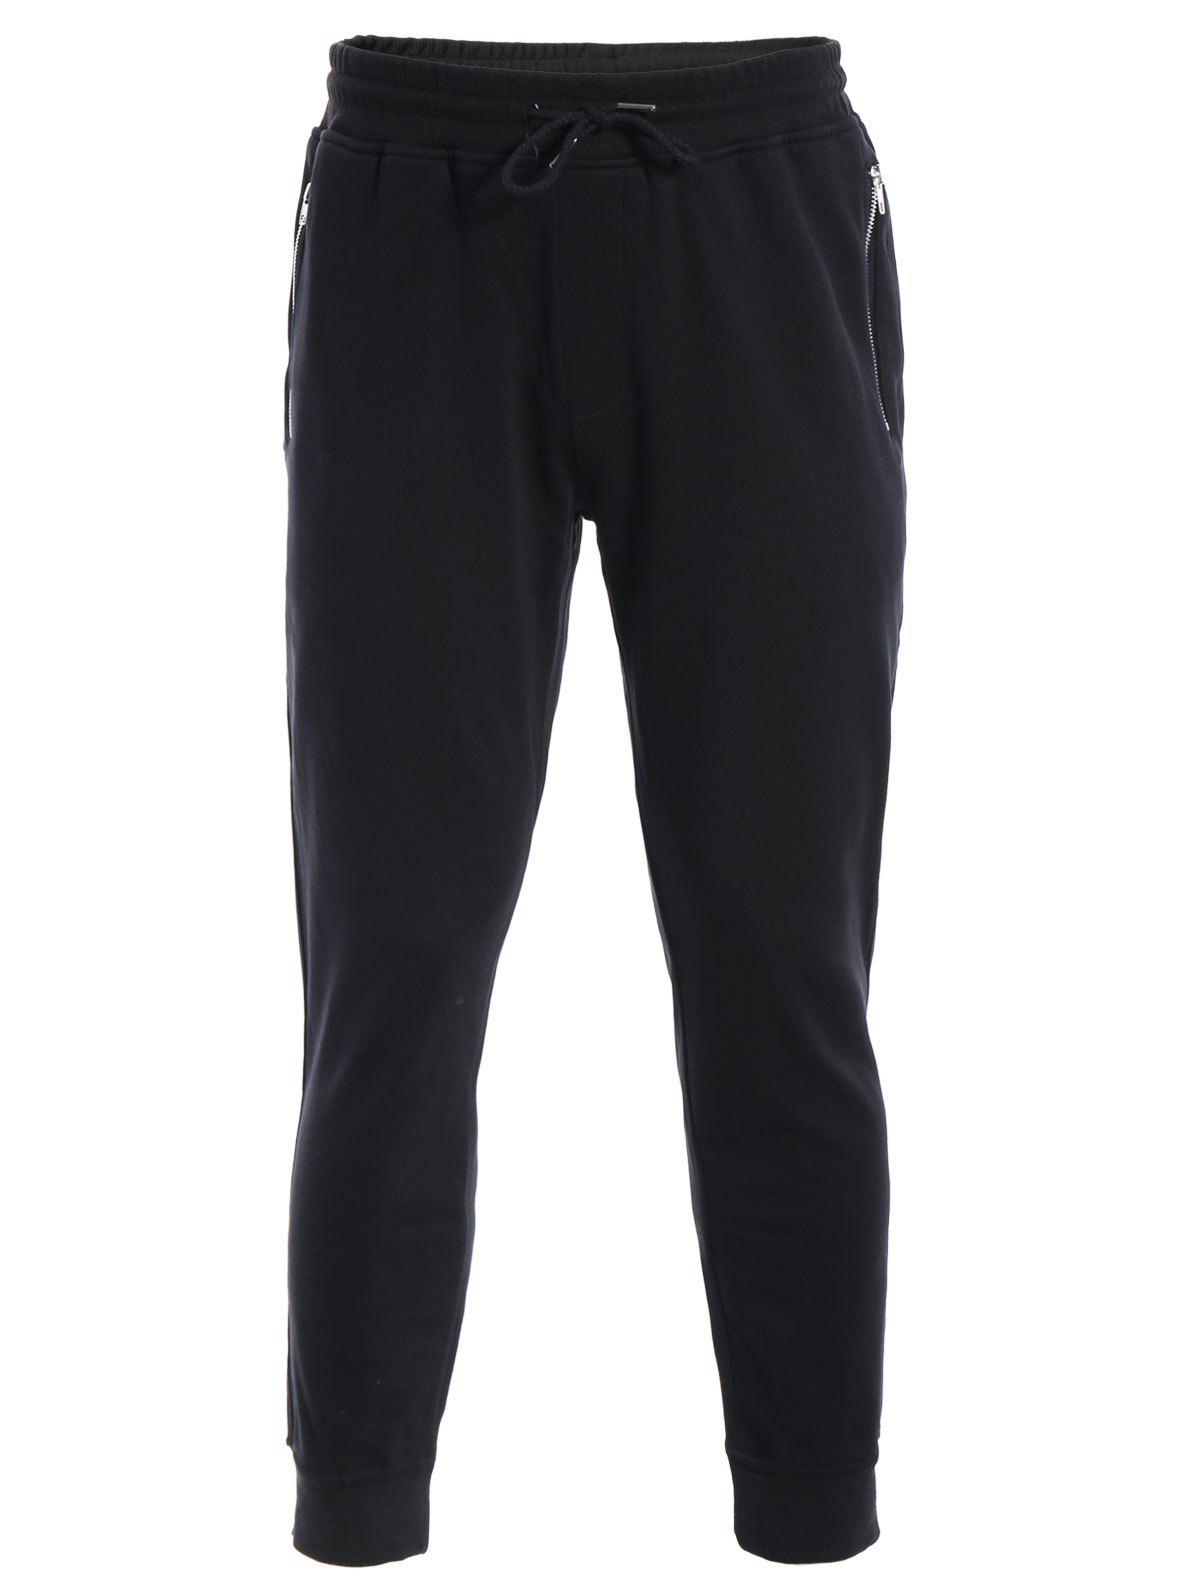 Image of Zip Pockets Mens Joggers Sweatpants